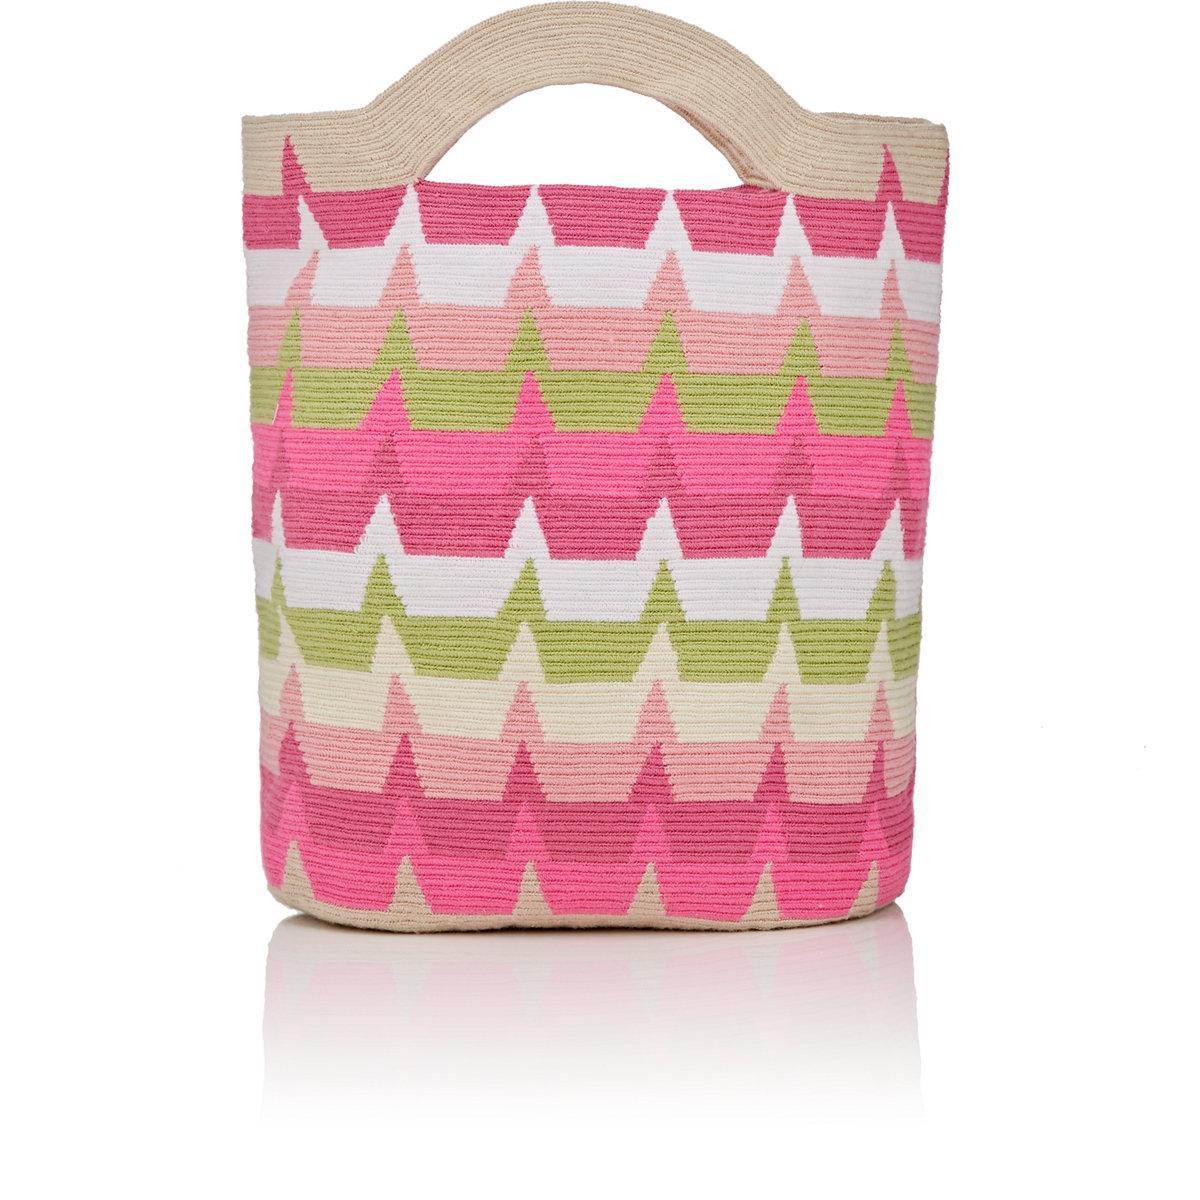 Womens Mila Small Shopper Tote Bag Sophie Anderson h0E62g51